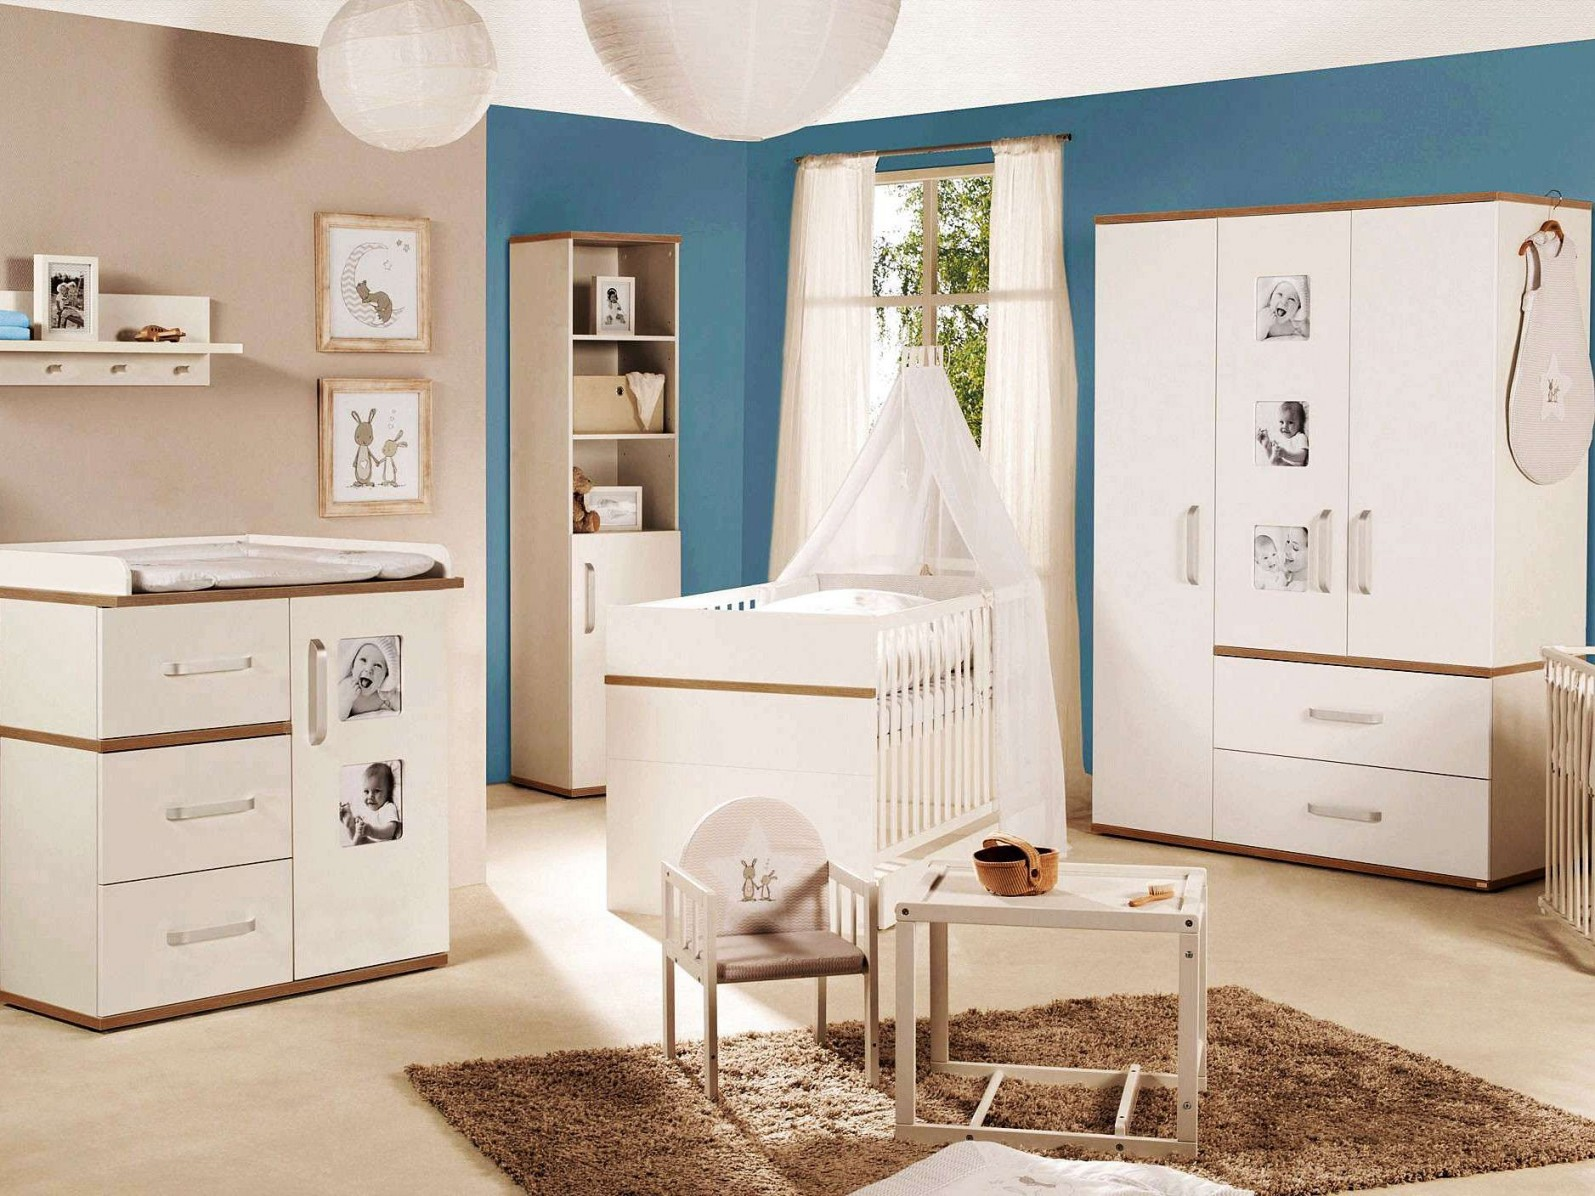 Baby Kinderzimmer Komplett Günstig Genial Babyzimmer Gunstig von Günstige Babyzimmer Komplett Bild